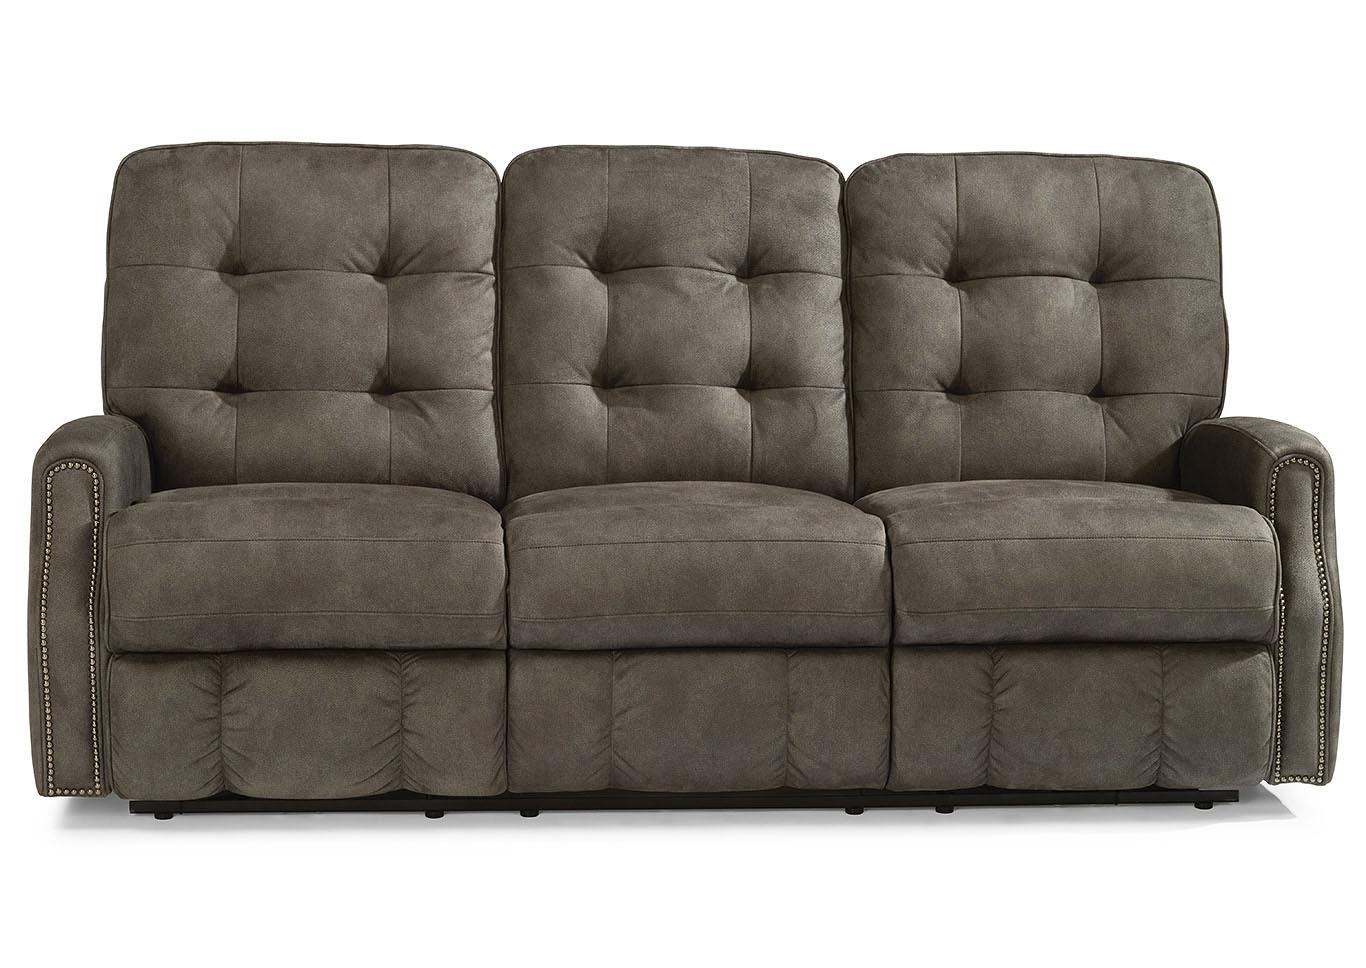 Genial Devon Fabric Power Reclining Sofa W/Nailhead Trim,Flexsteel